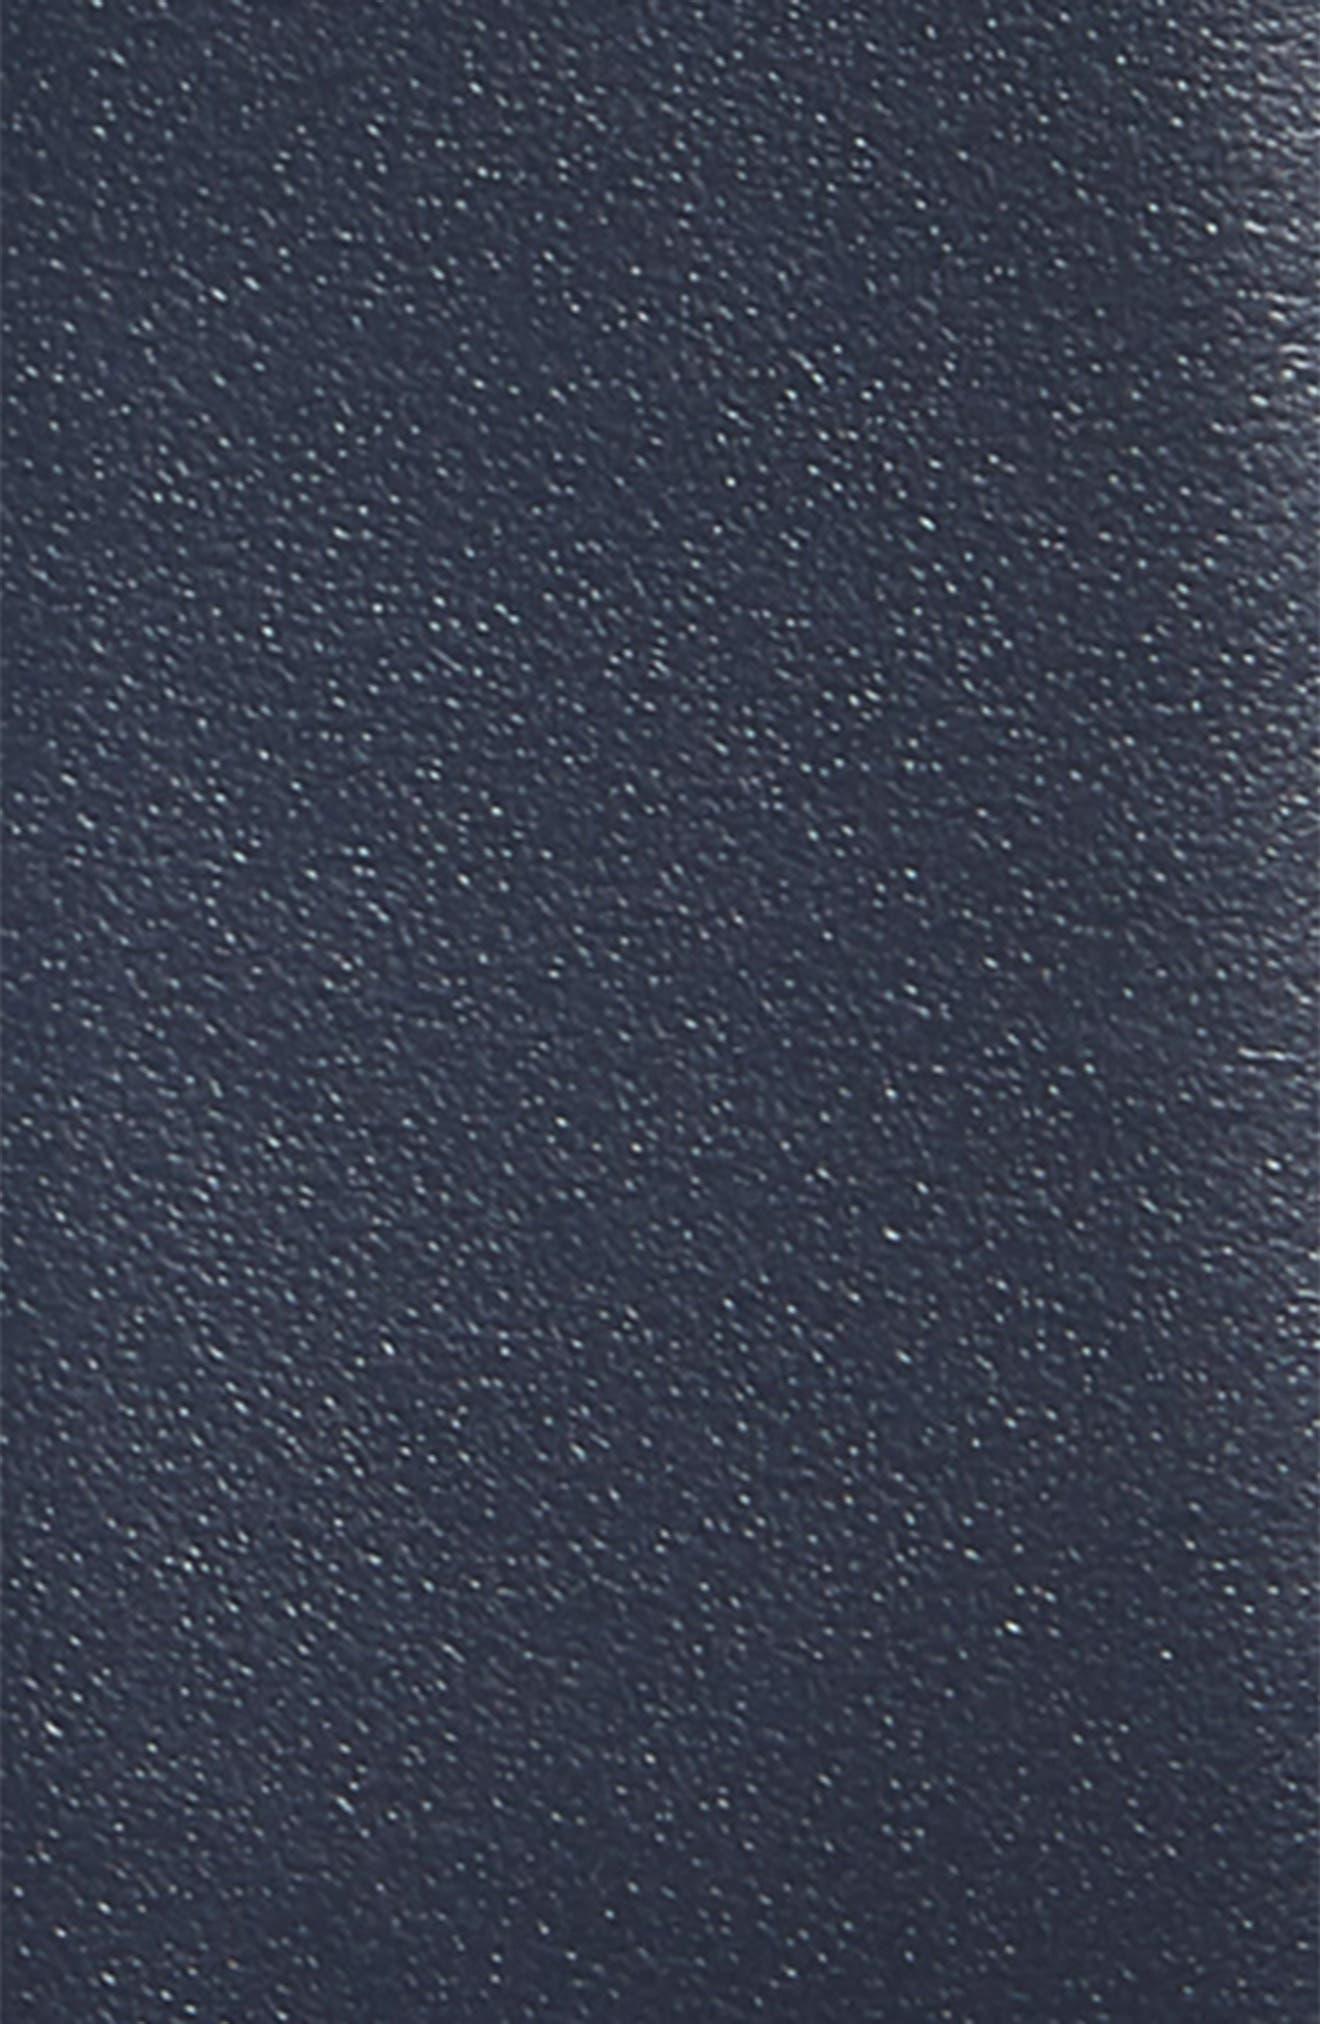 Double Gancio Reversible Leather Belt,                             Alternate thumbnail 3, color,                             Blue Marine/ Black